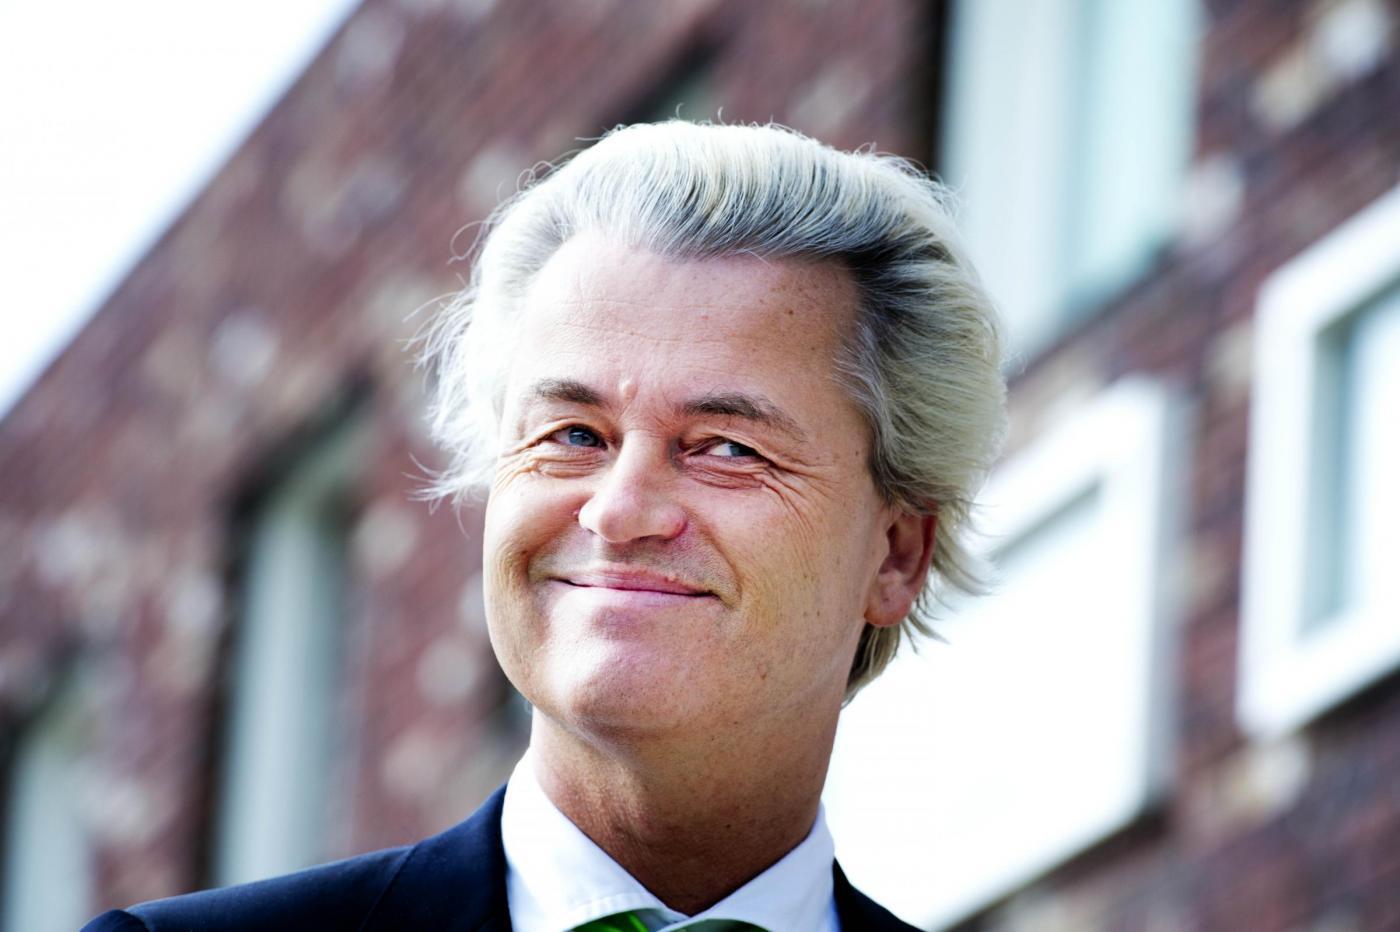 Europawahl Geert Wilders al voto in Olanda